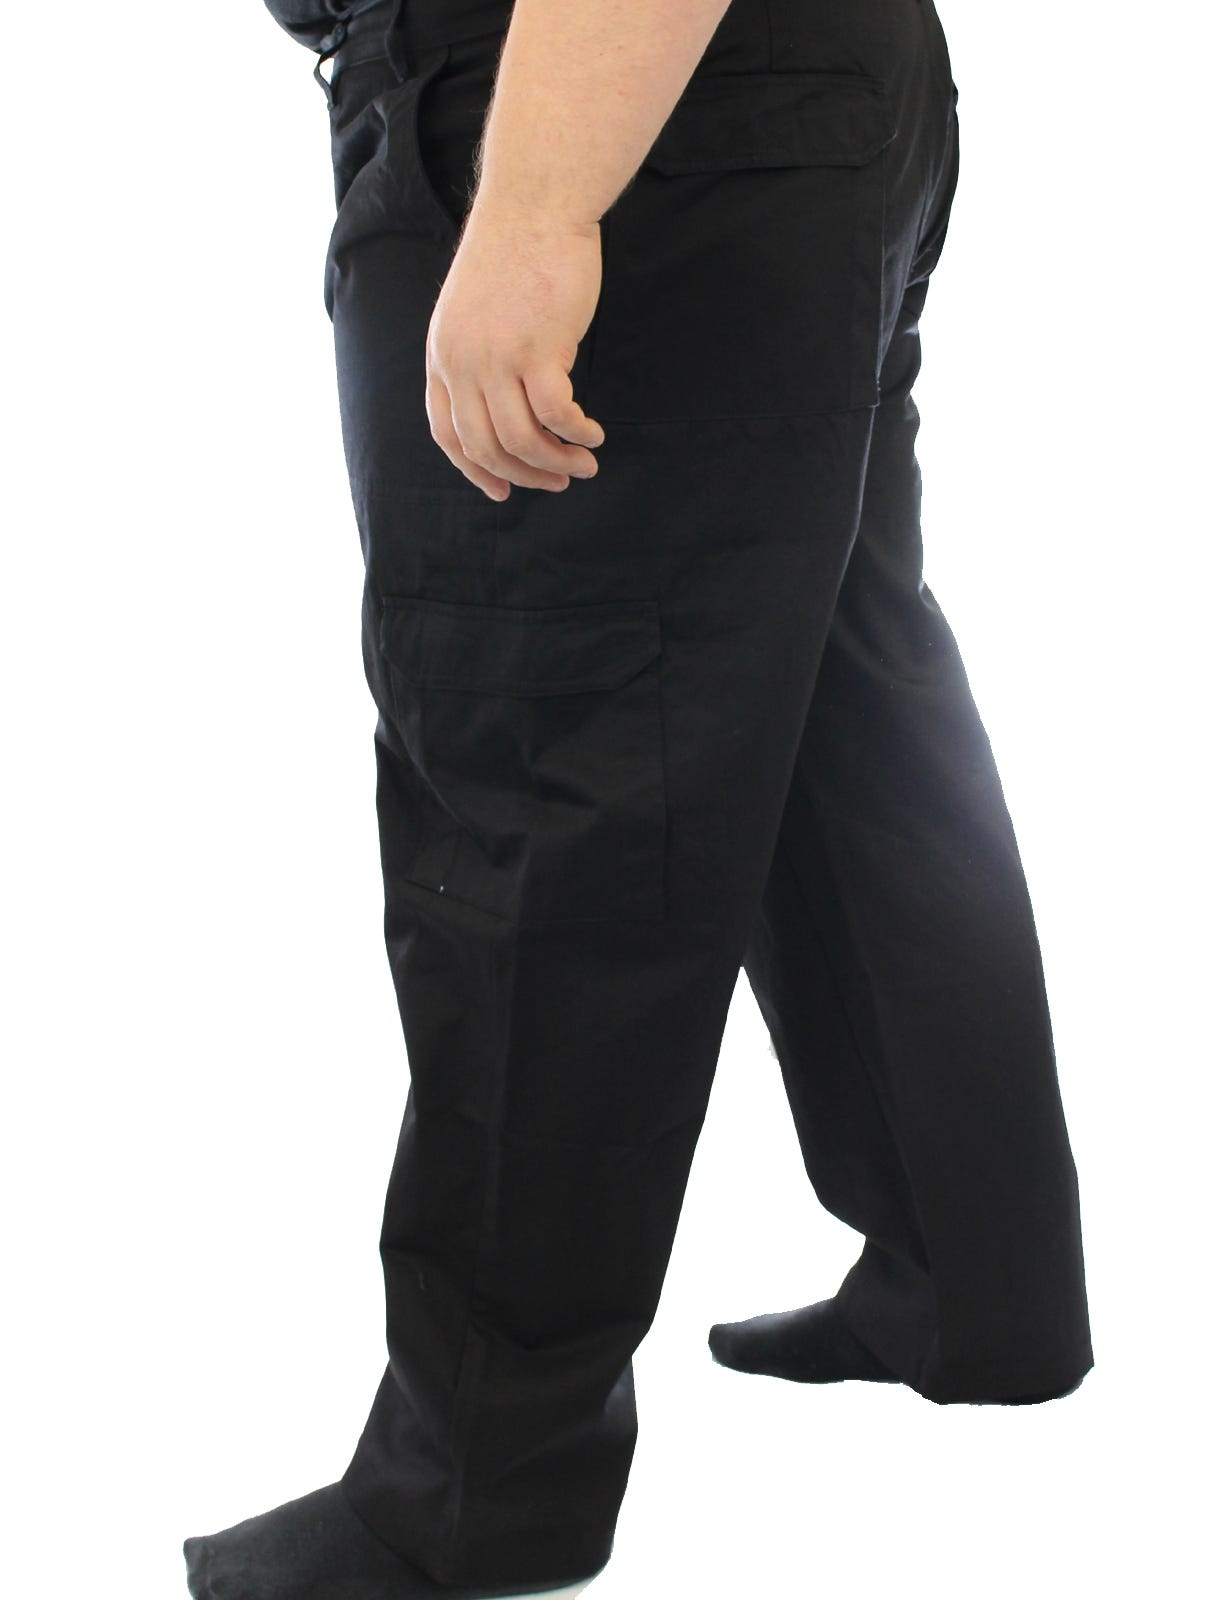 "Ed Baxter Victory - Heavy Duty Cargo Combat Trousers  - Black - 62"" Waist, 34"" Leg"